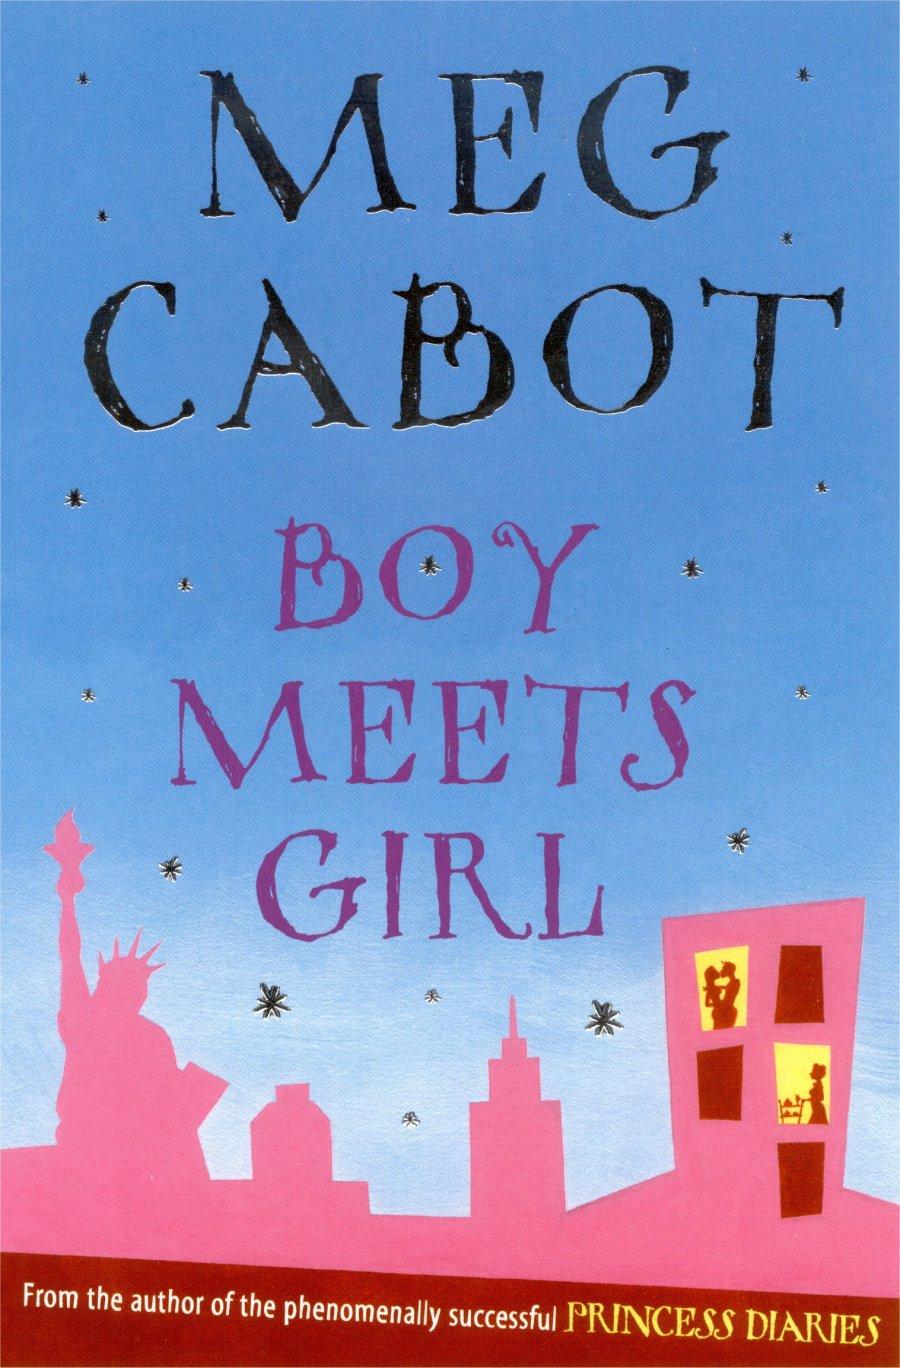 Boy Meets Girl by Meg Cabot  Amazon  |  Goodreads